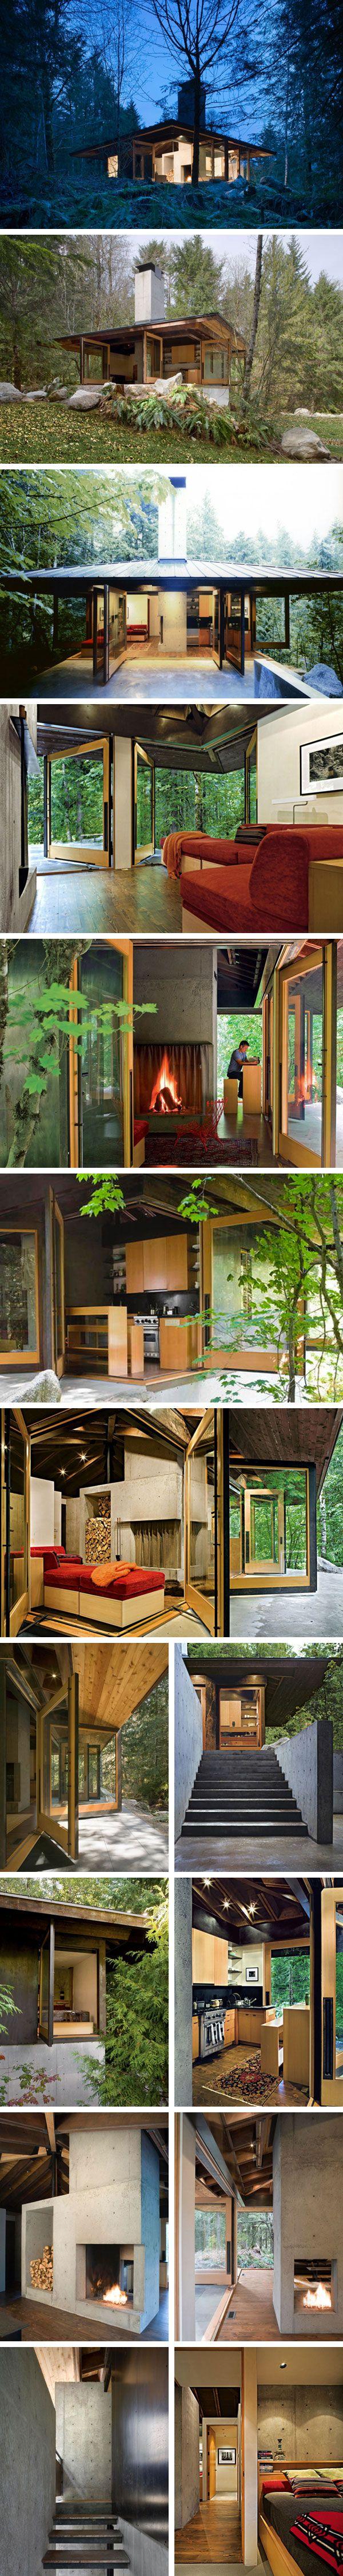 Маленький дом Tye River Cabin от Olson Kundig #tinyhomesdigest #tinyhouse #ecohouse #smallhouse